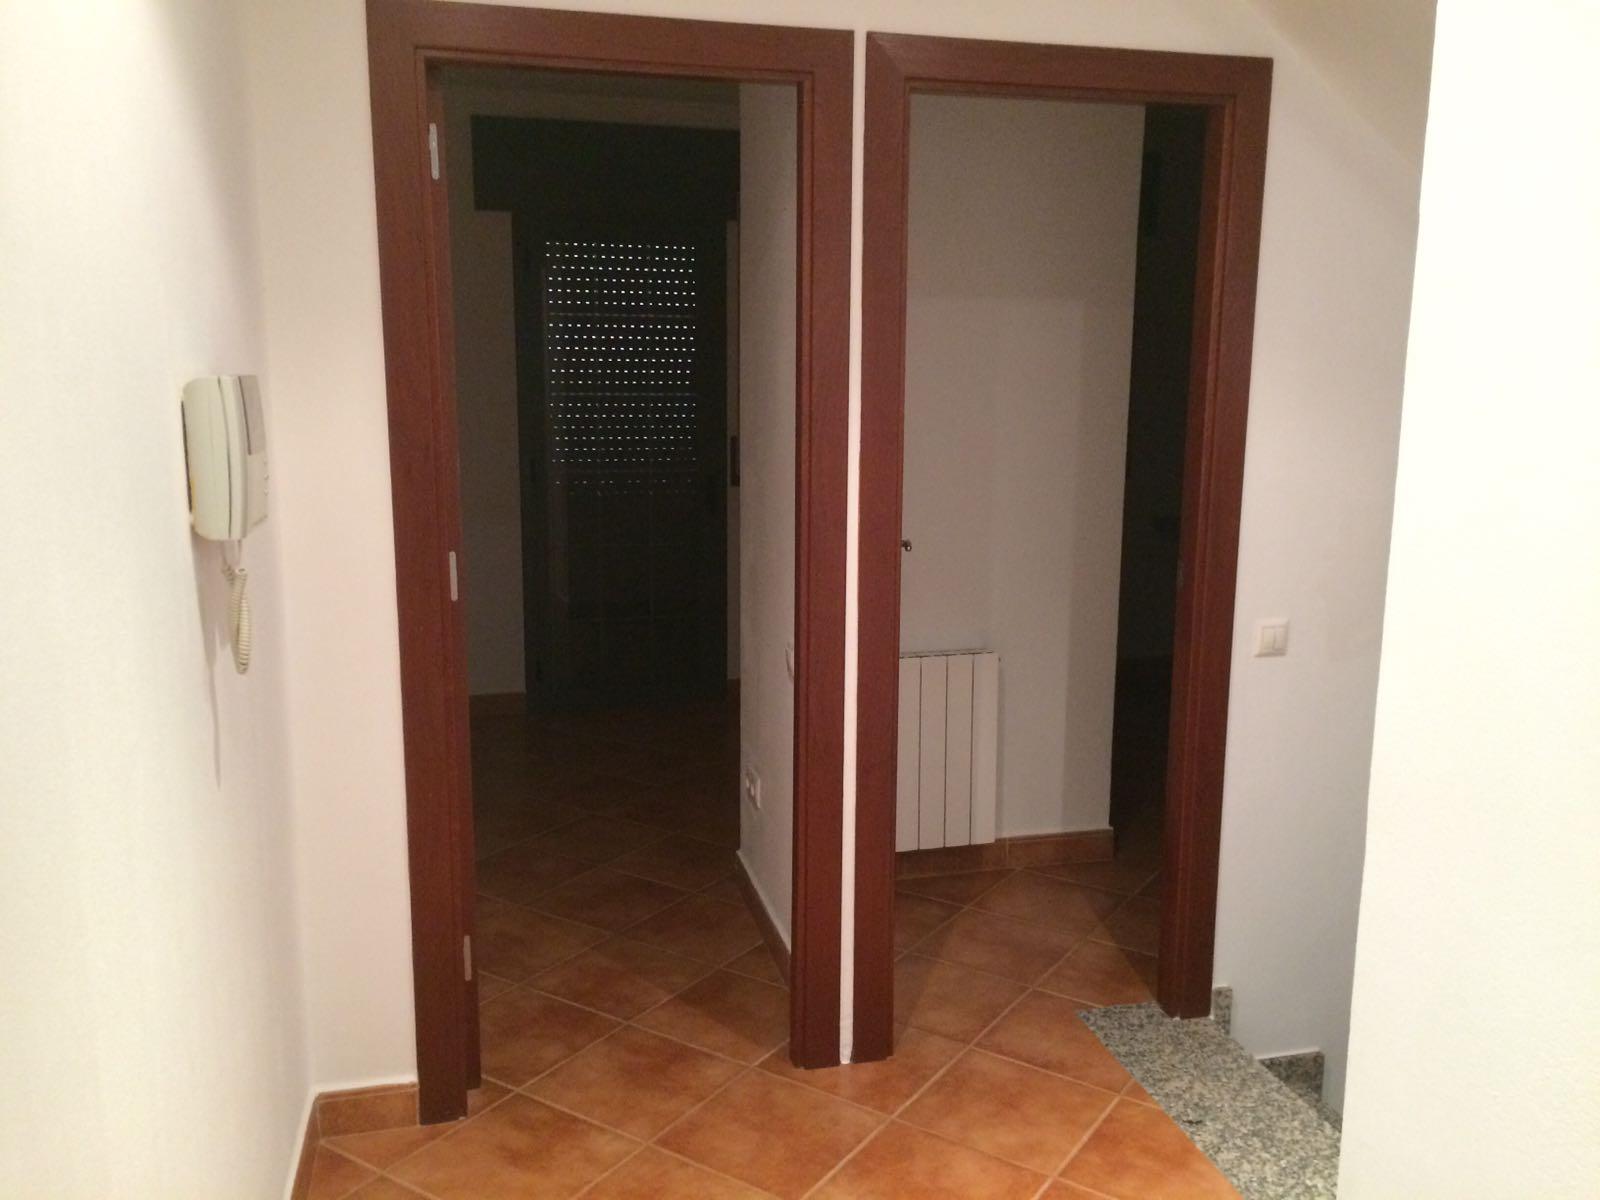 Chalet adosado en Sant Boi de Llobregat (Vivienda en Sant Boi de Llobregat) - foto4